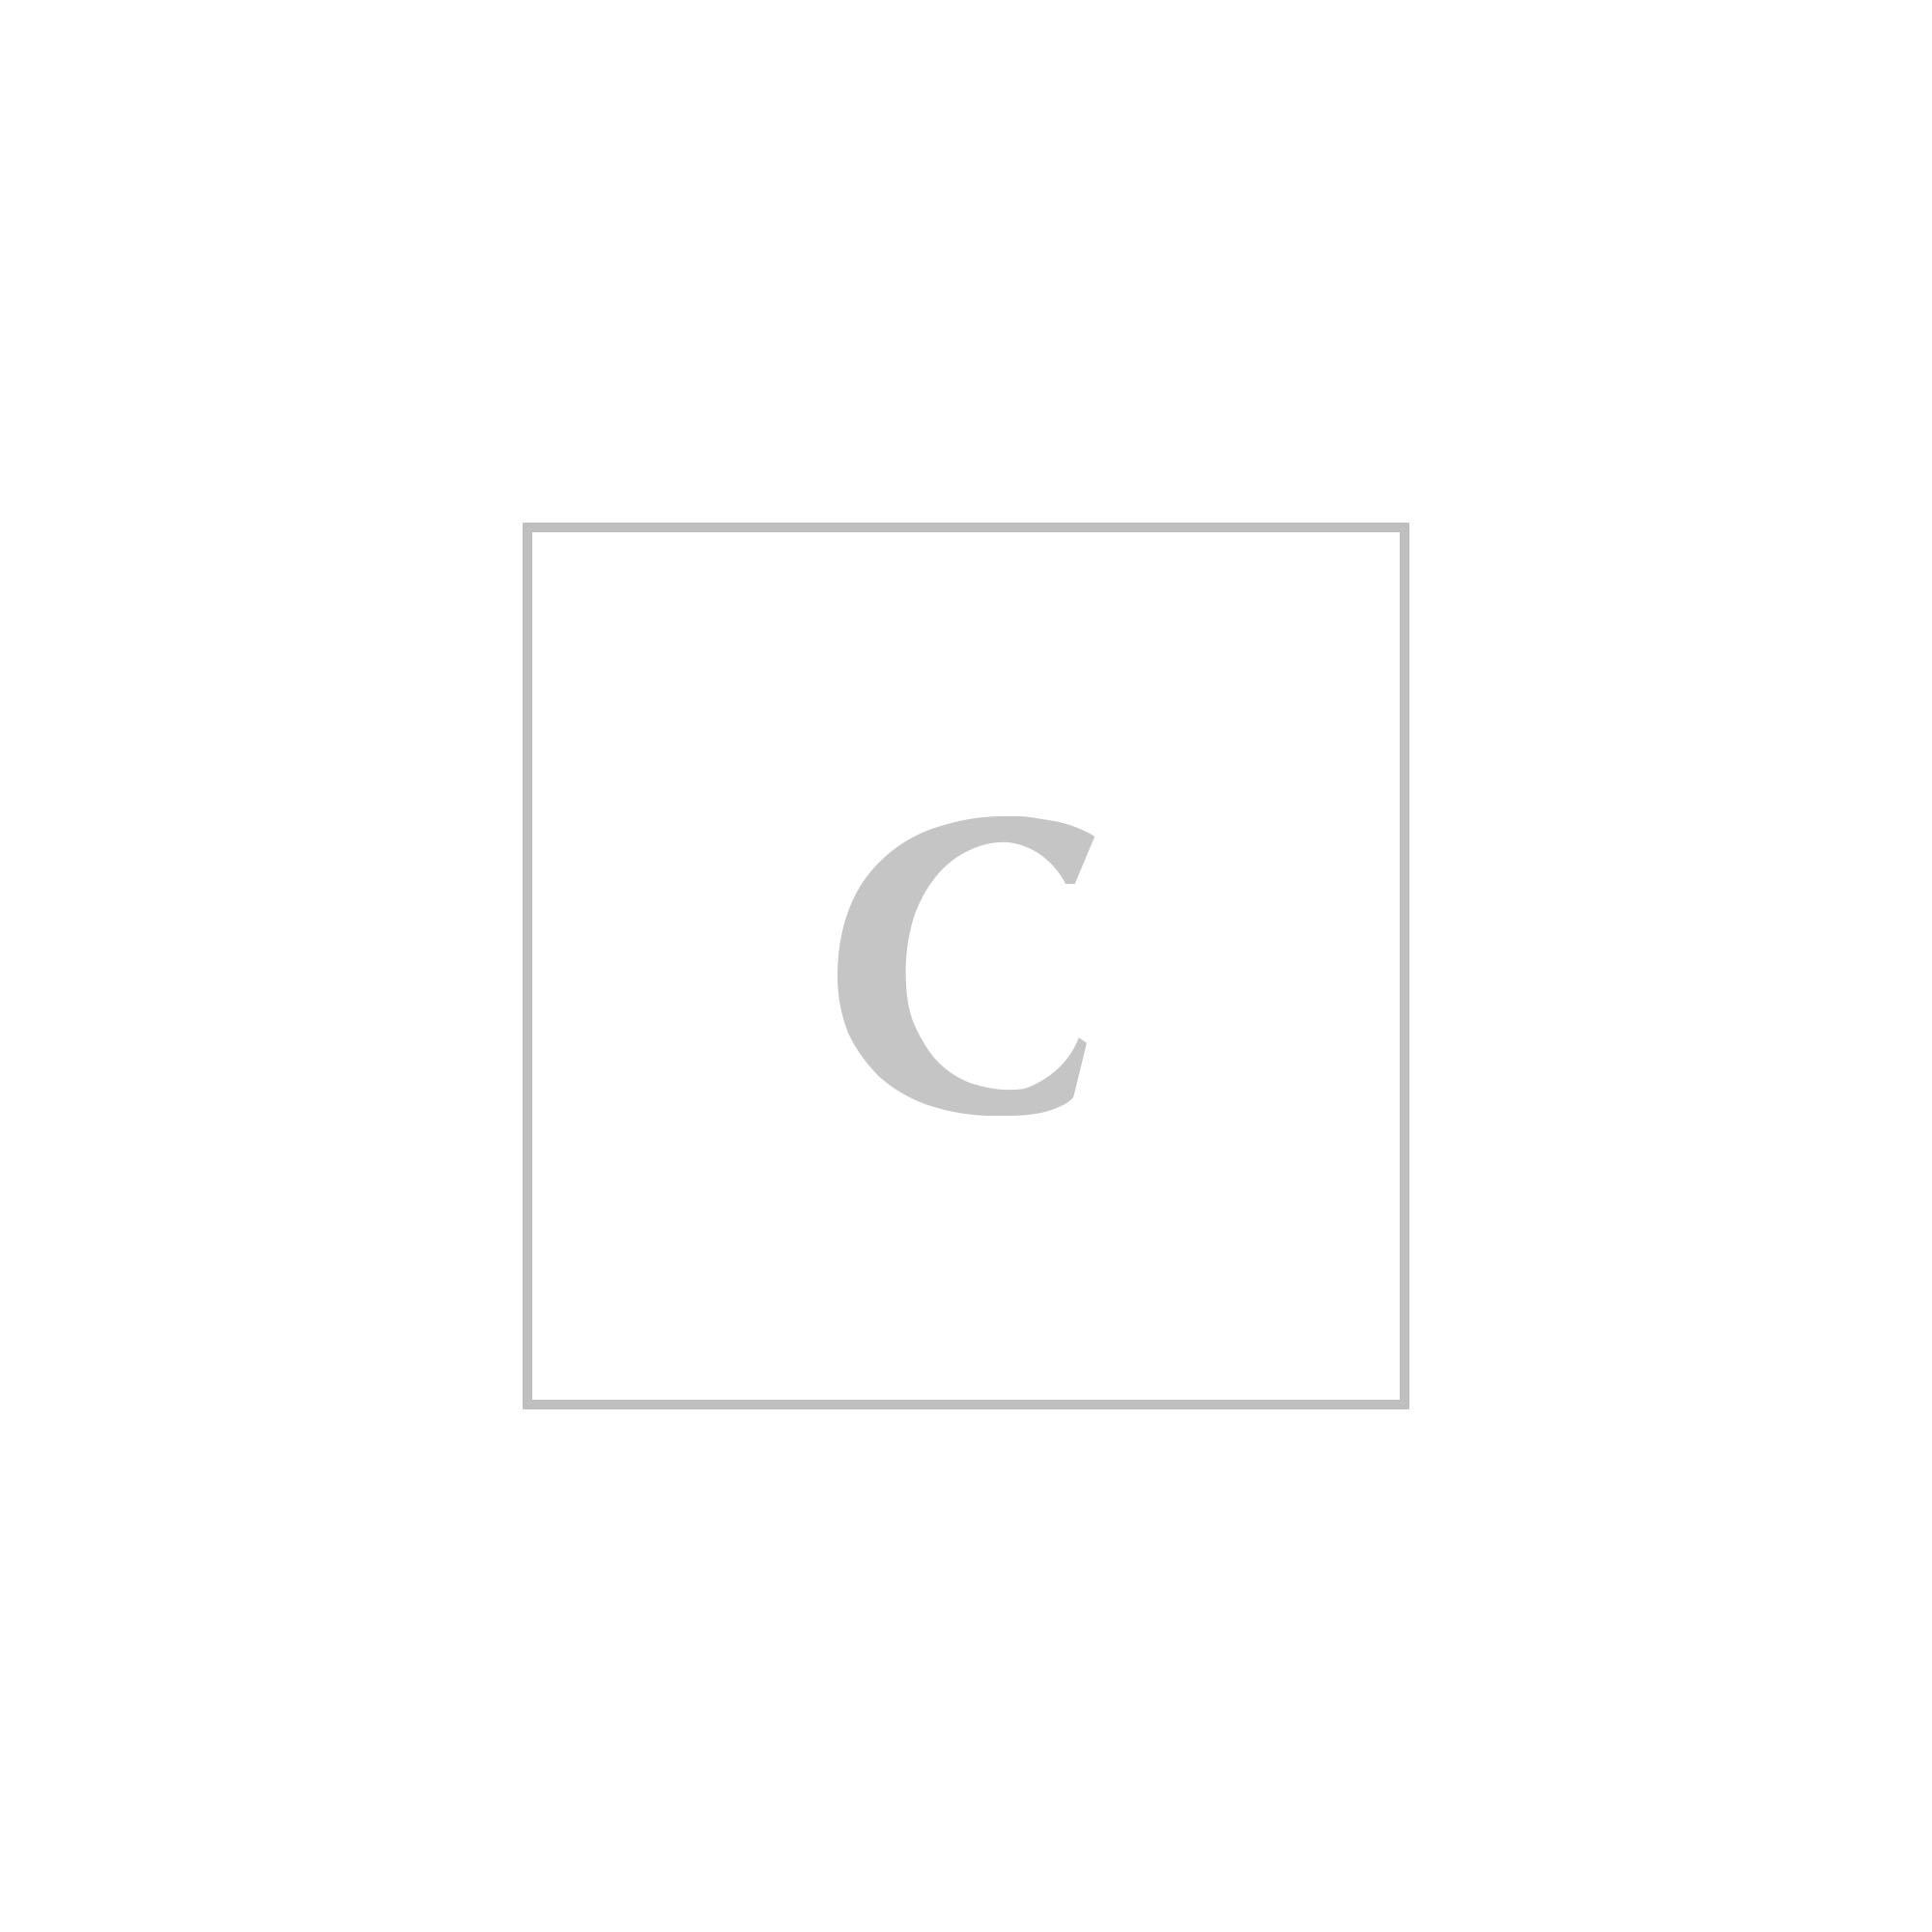 Saint laurent borsa monogram dylan small